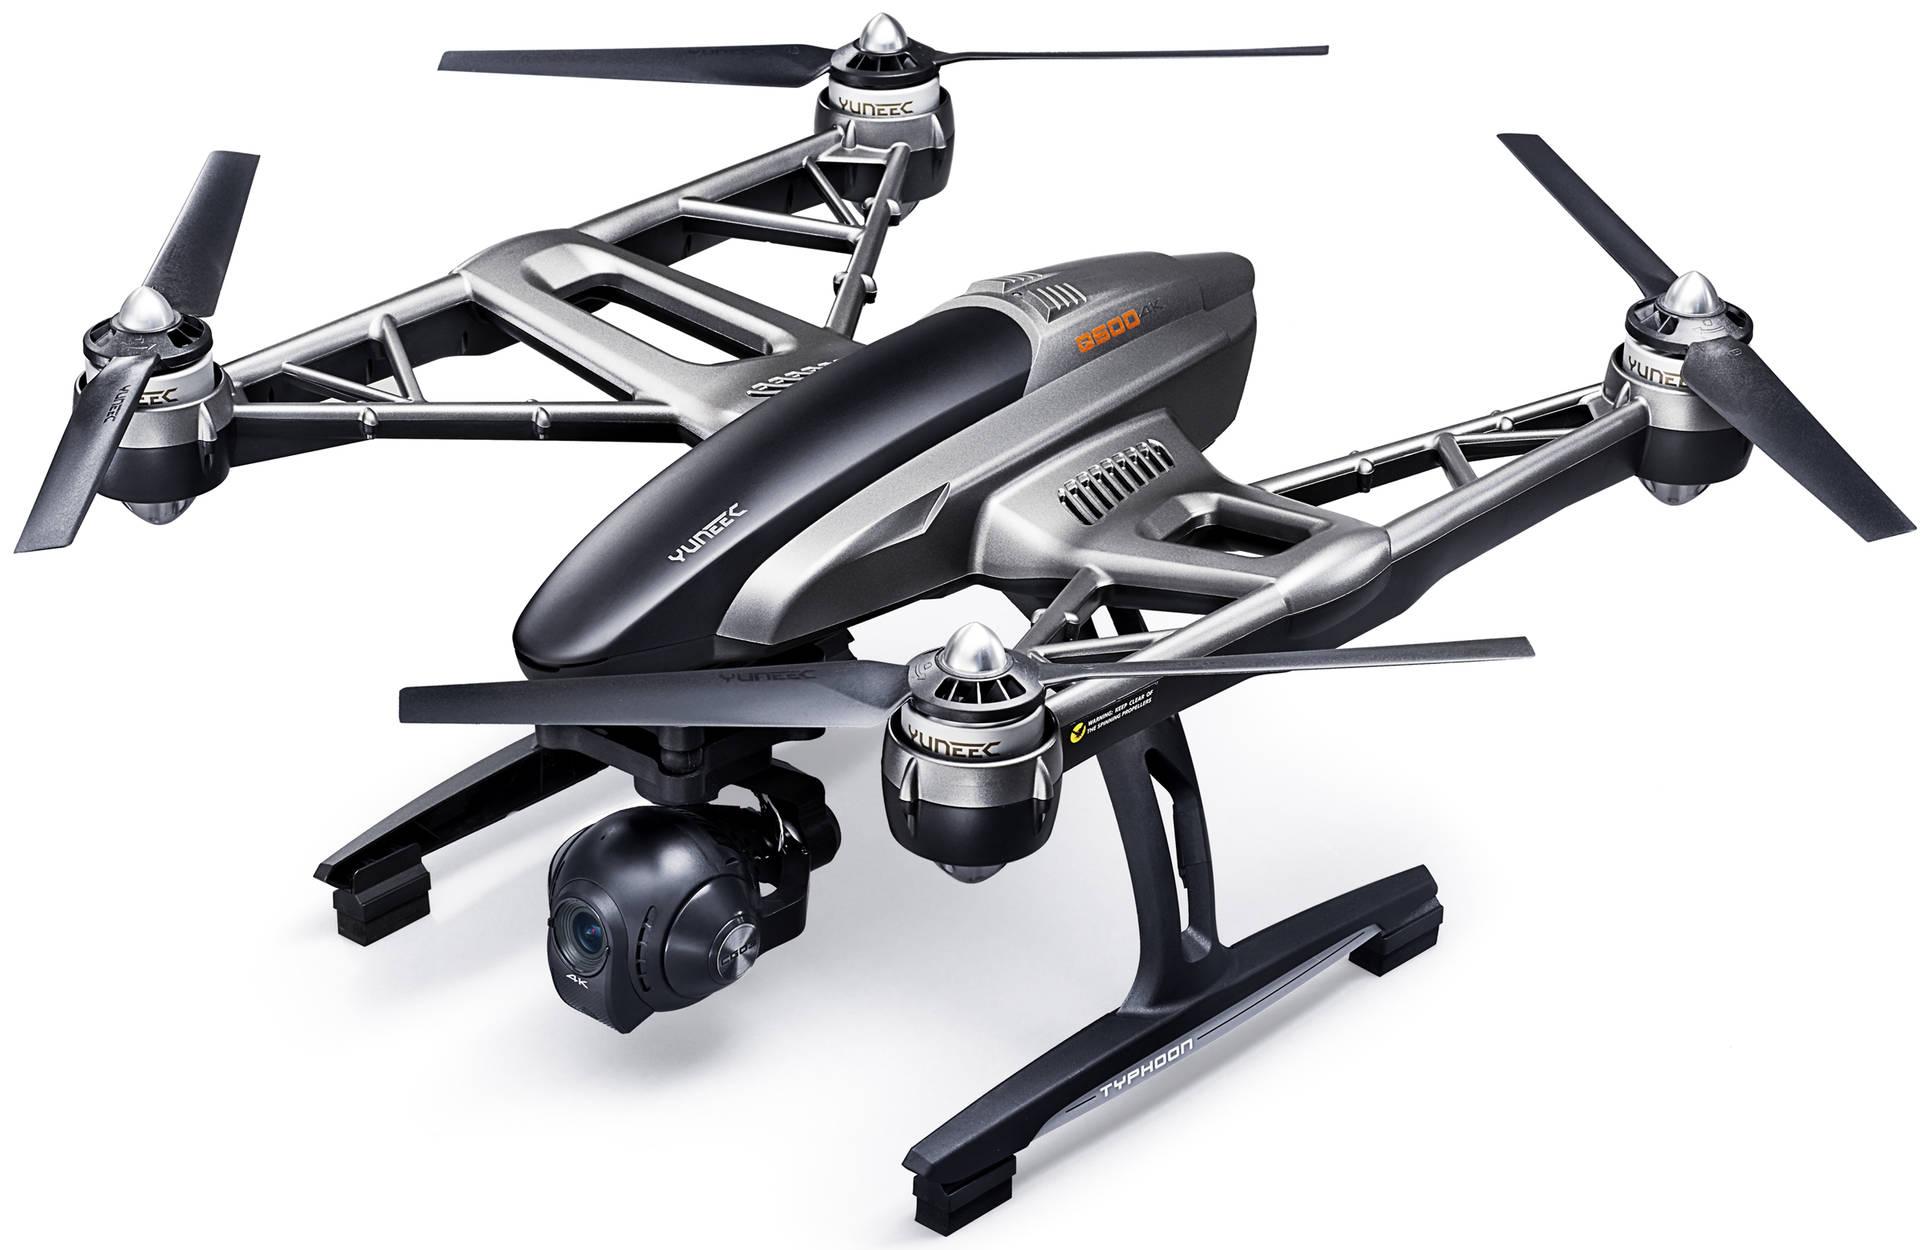 Top 10 drones 2016 - Yuneec Q500 4K Typhoon drone